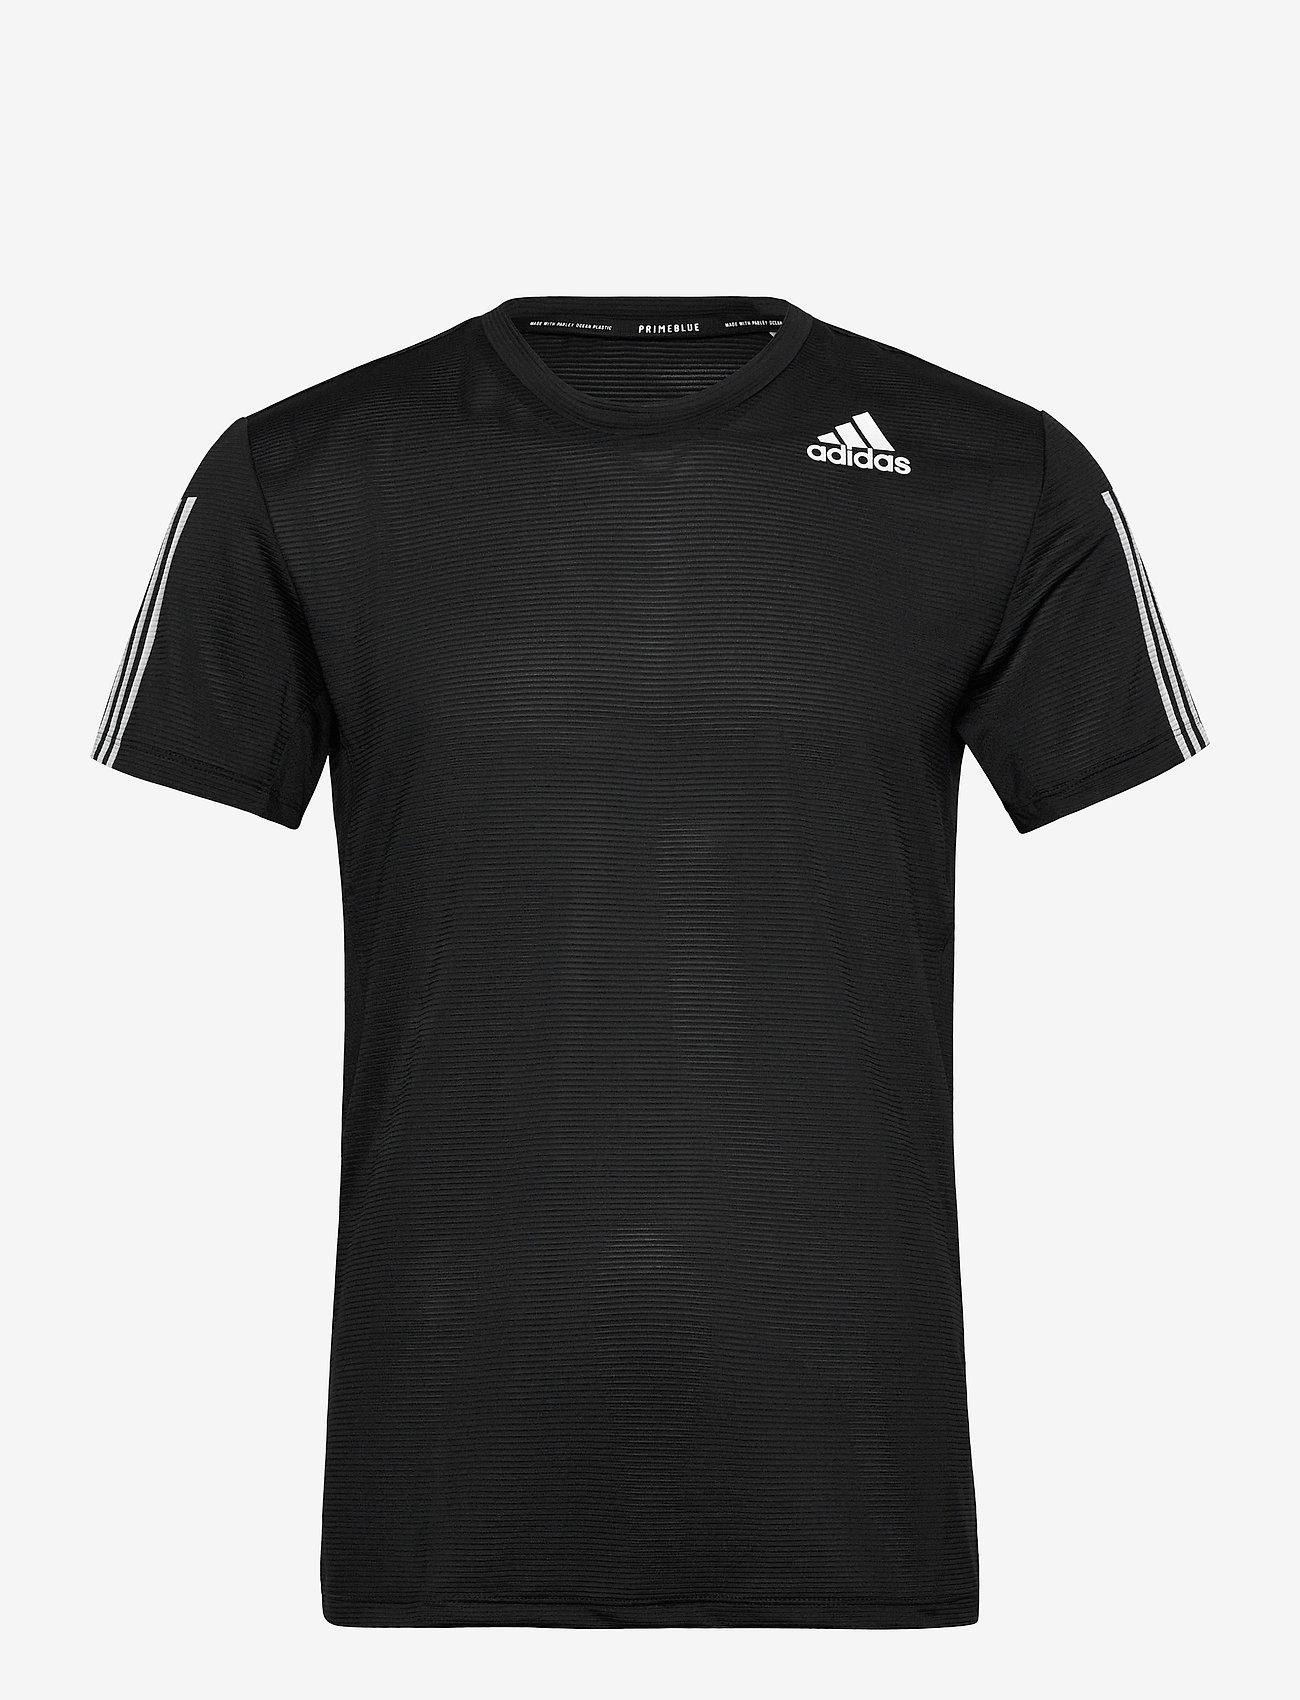 adidas Performance - Primeblue AEROREADY 3-Stripes Slim T-Shirt - oberteile & t-shirts - black - 1